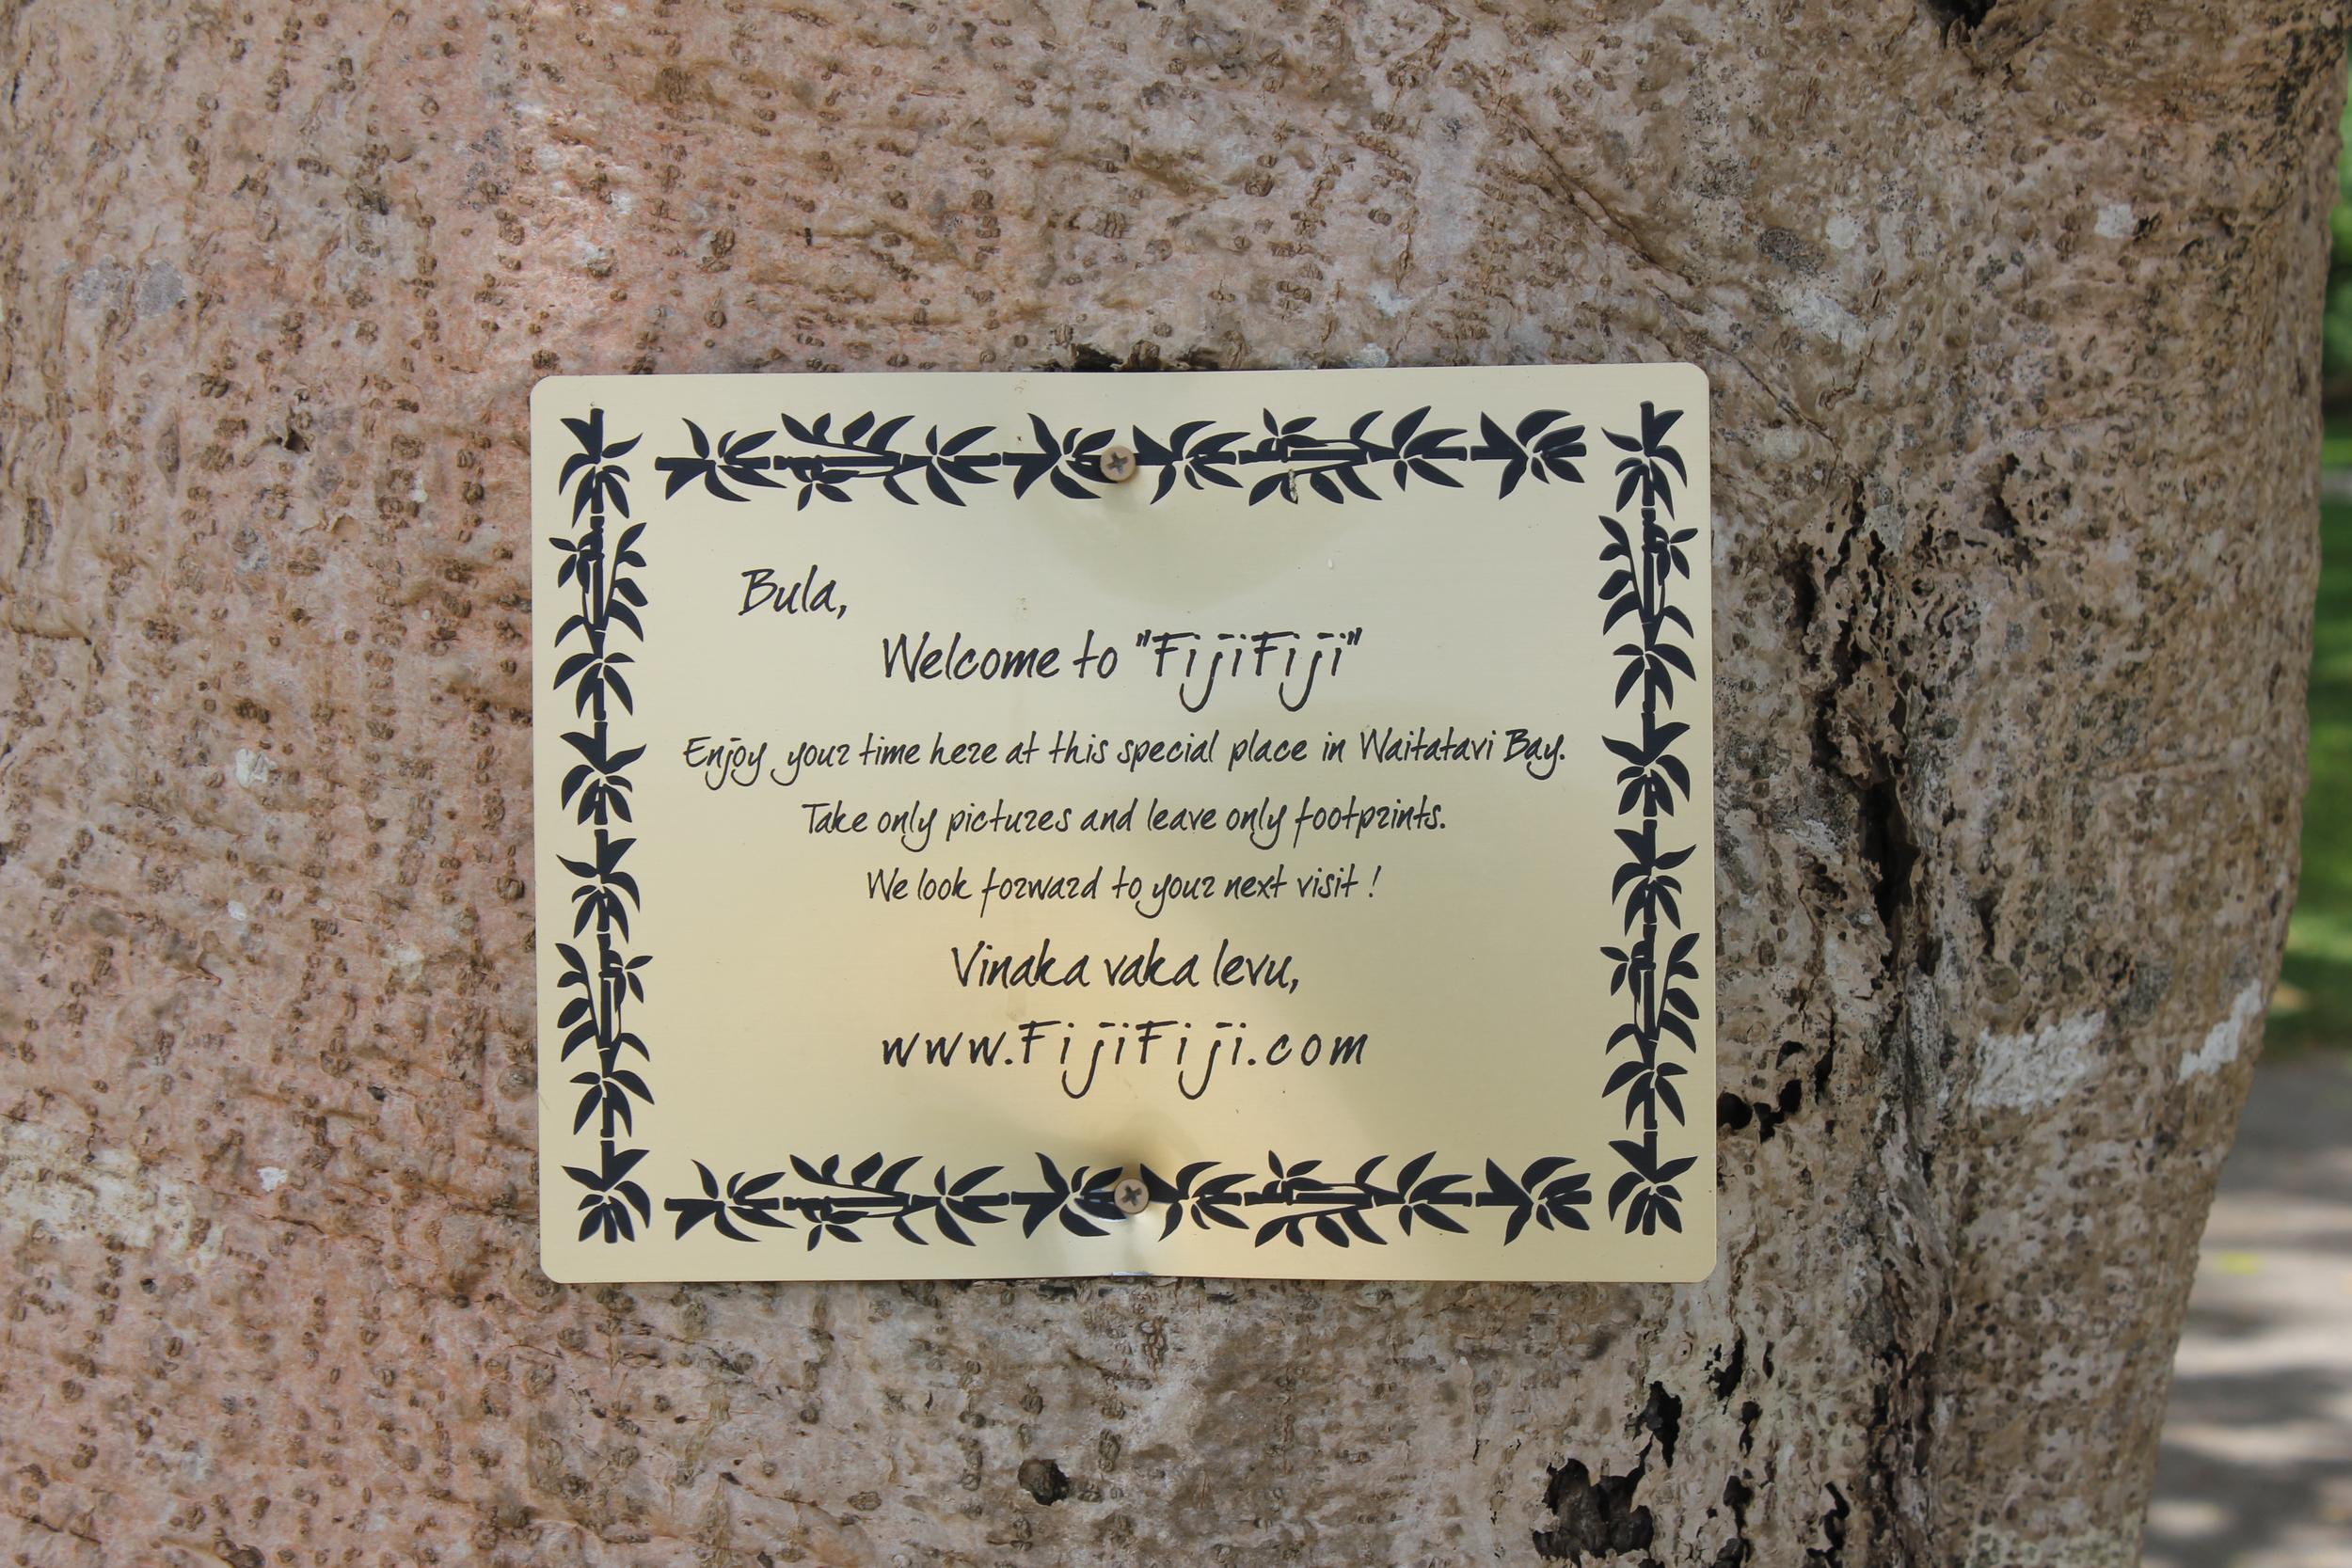 Sign at Waitatavi, greeting guests ...